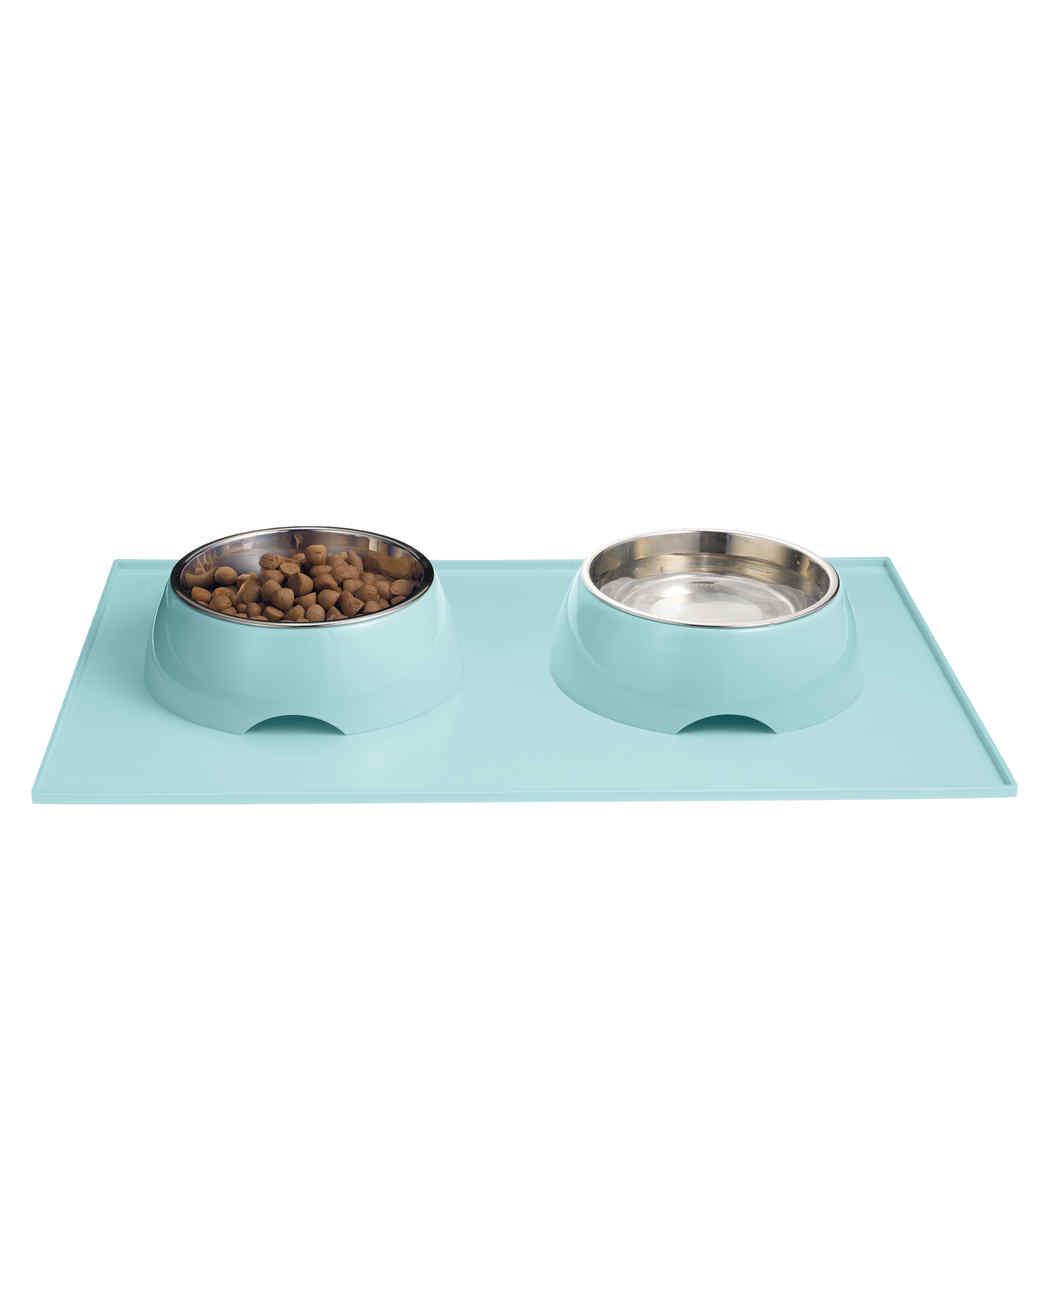 mspets-bowls-mrkt-1212.jpg